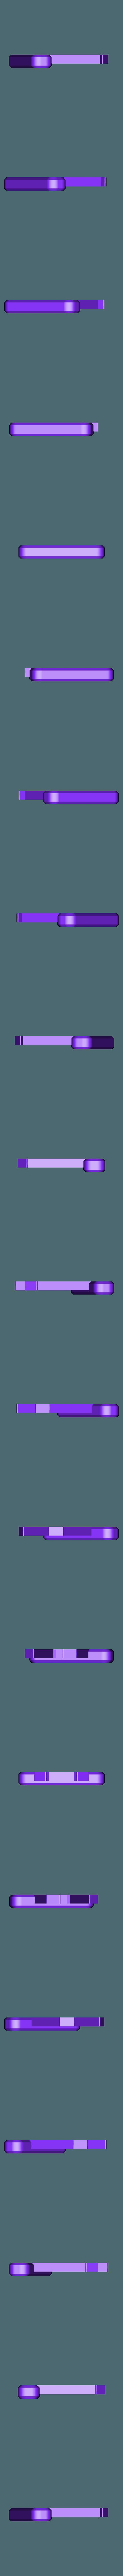 aShoeKlips6_p1.stl Download free STL file Yet another shoelaces clips v2 • 3D print design, MuSSy